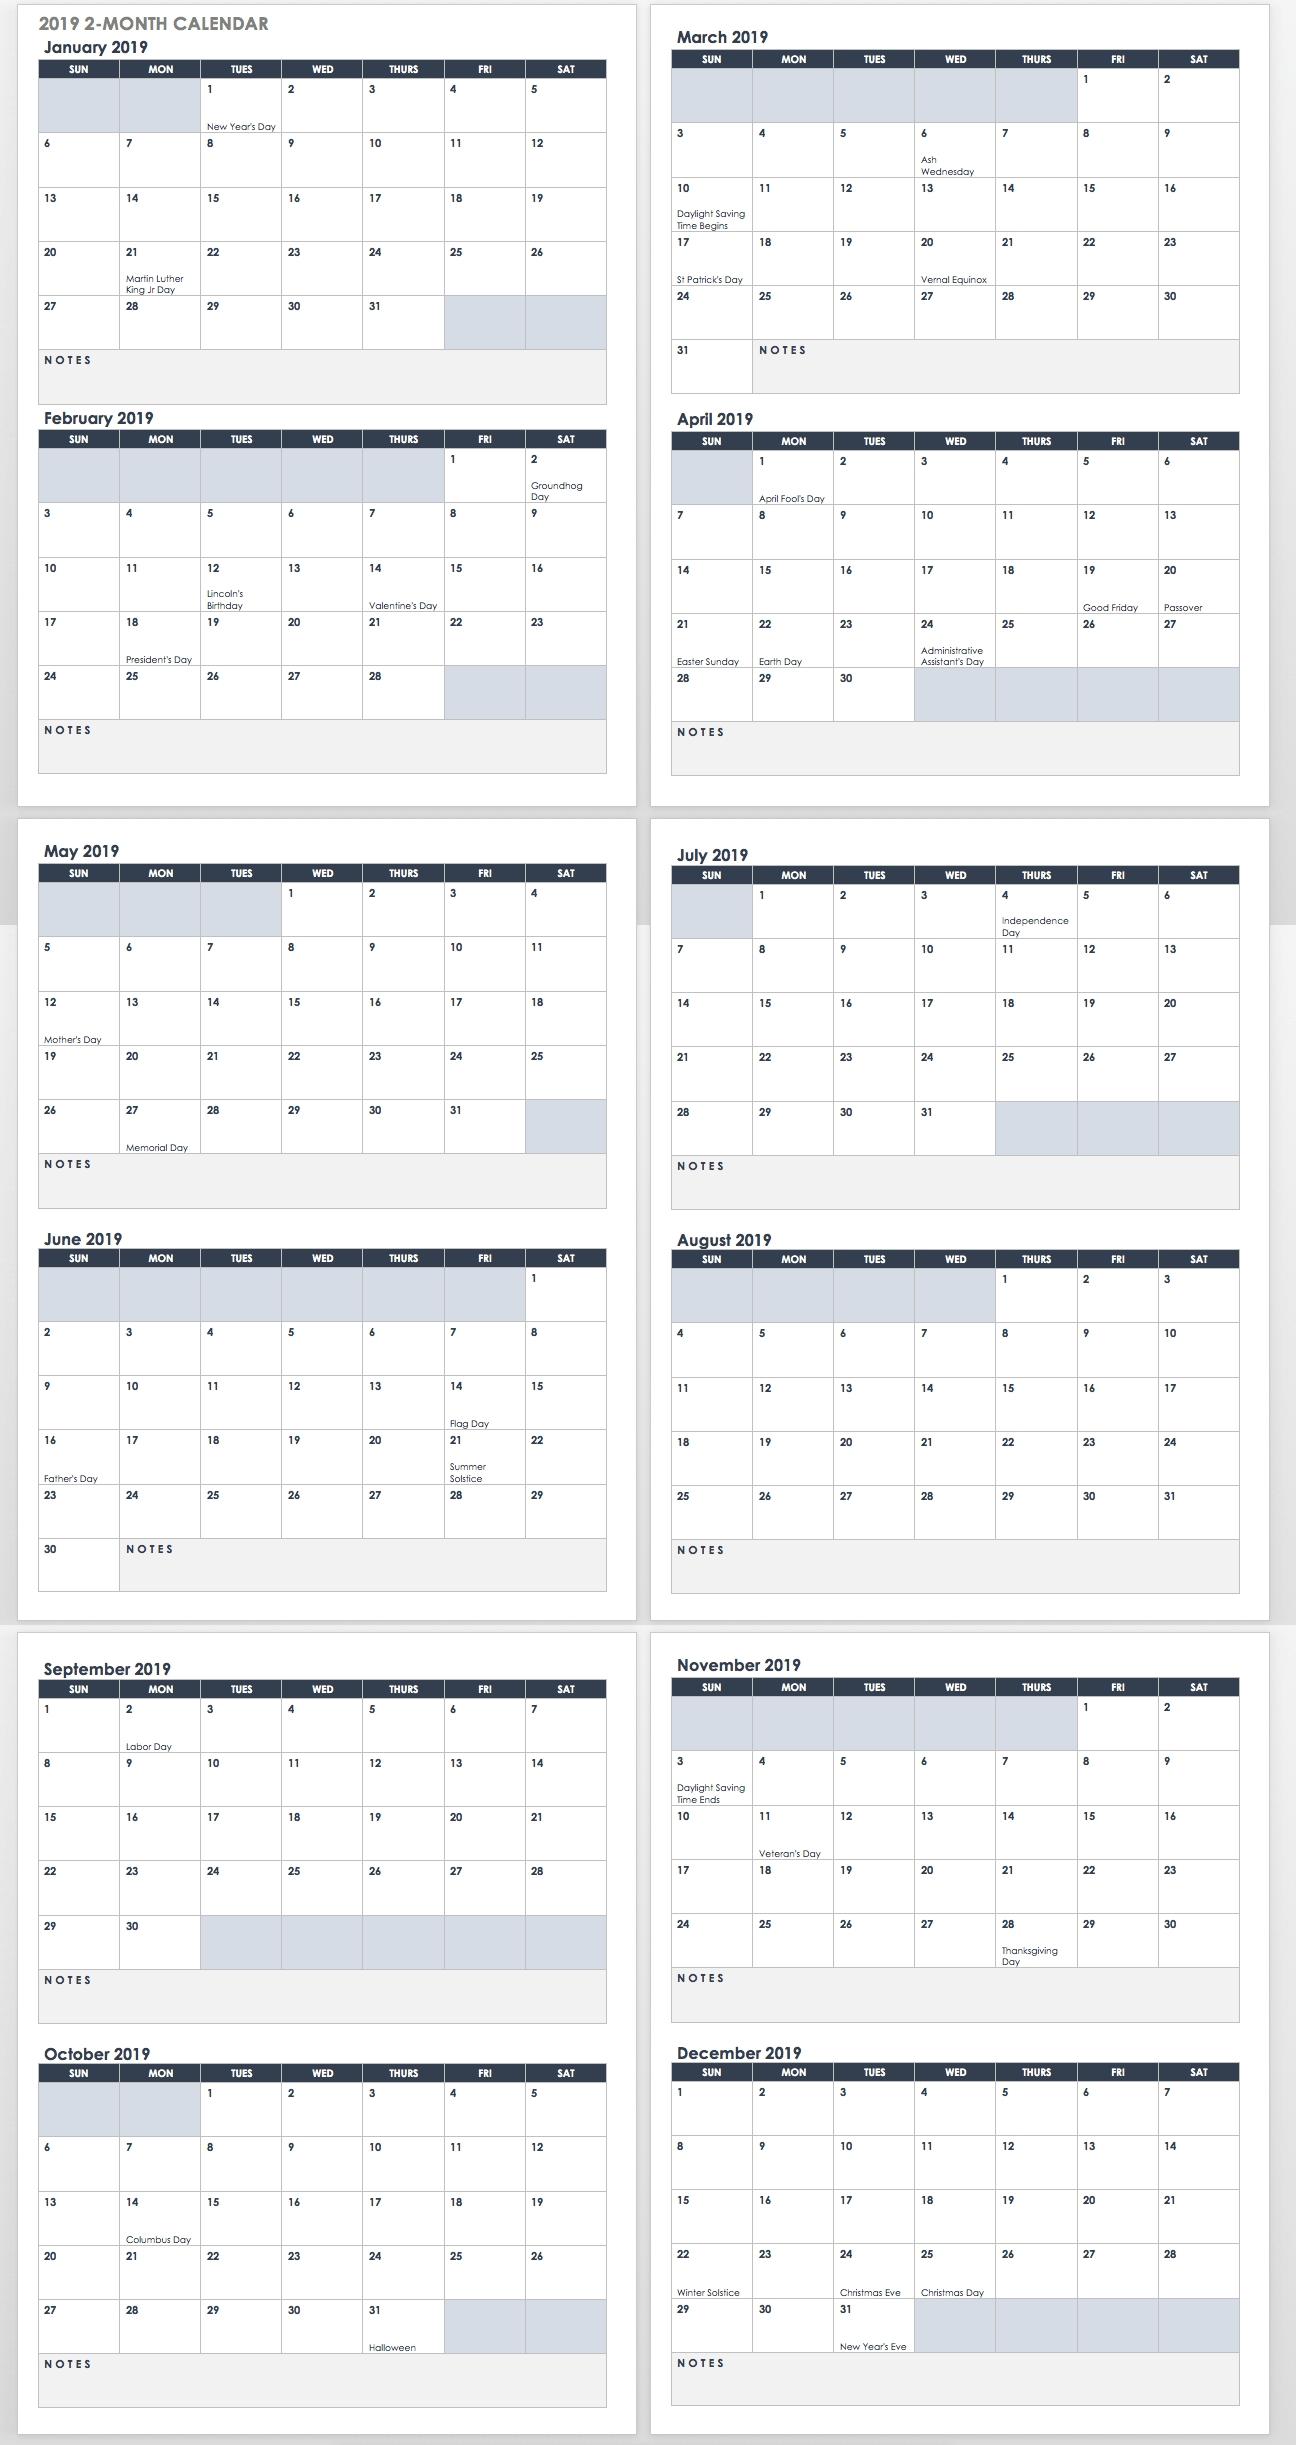 15 Free Monthly Calendar Templates | Smartsheet intended for Monthly Calendar Templates Monday To Friday